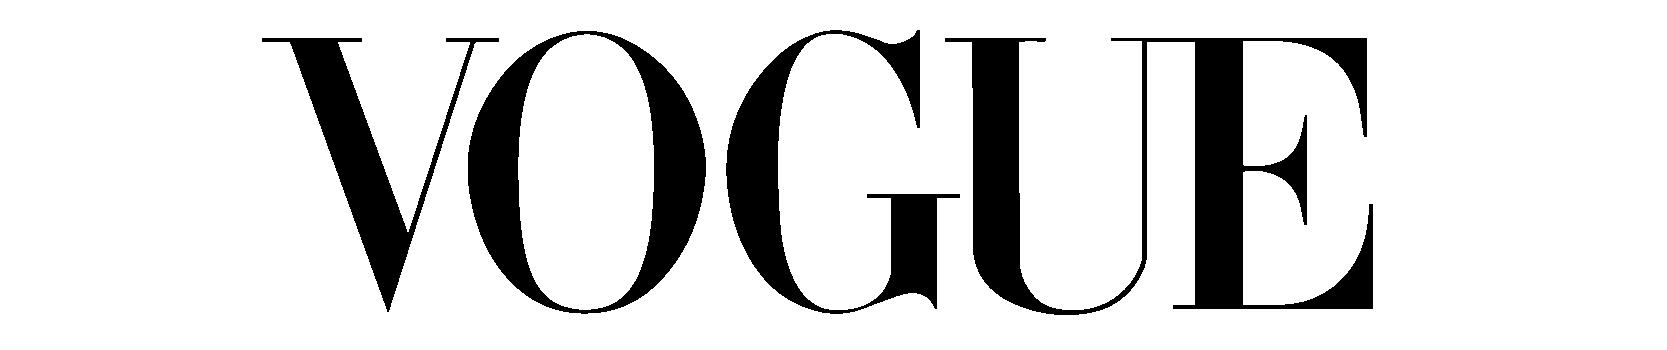 Press logos-07 copy_2.png